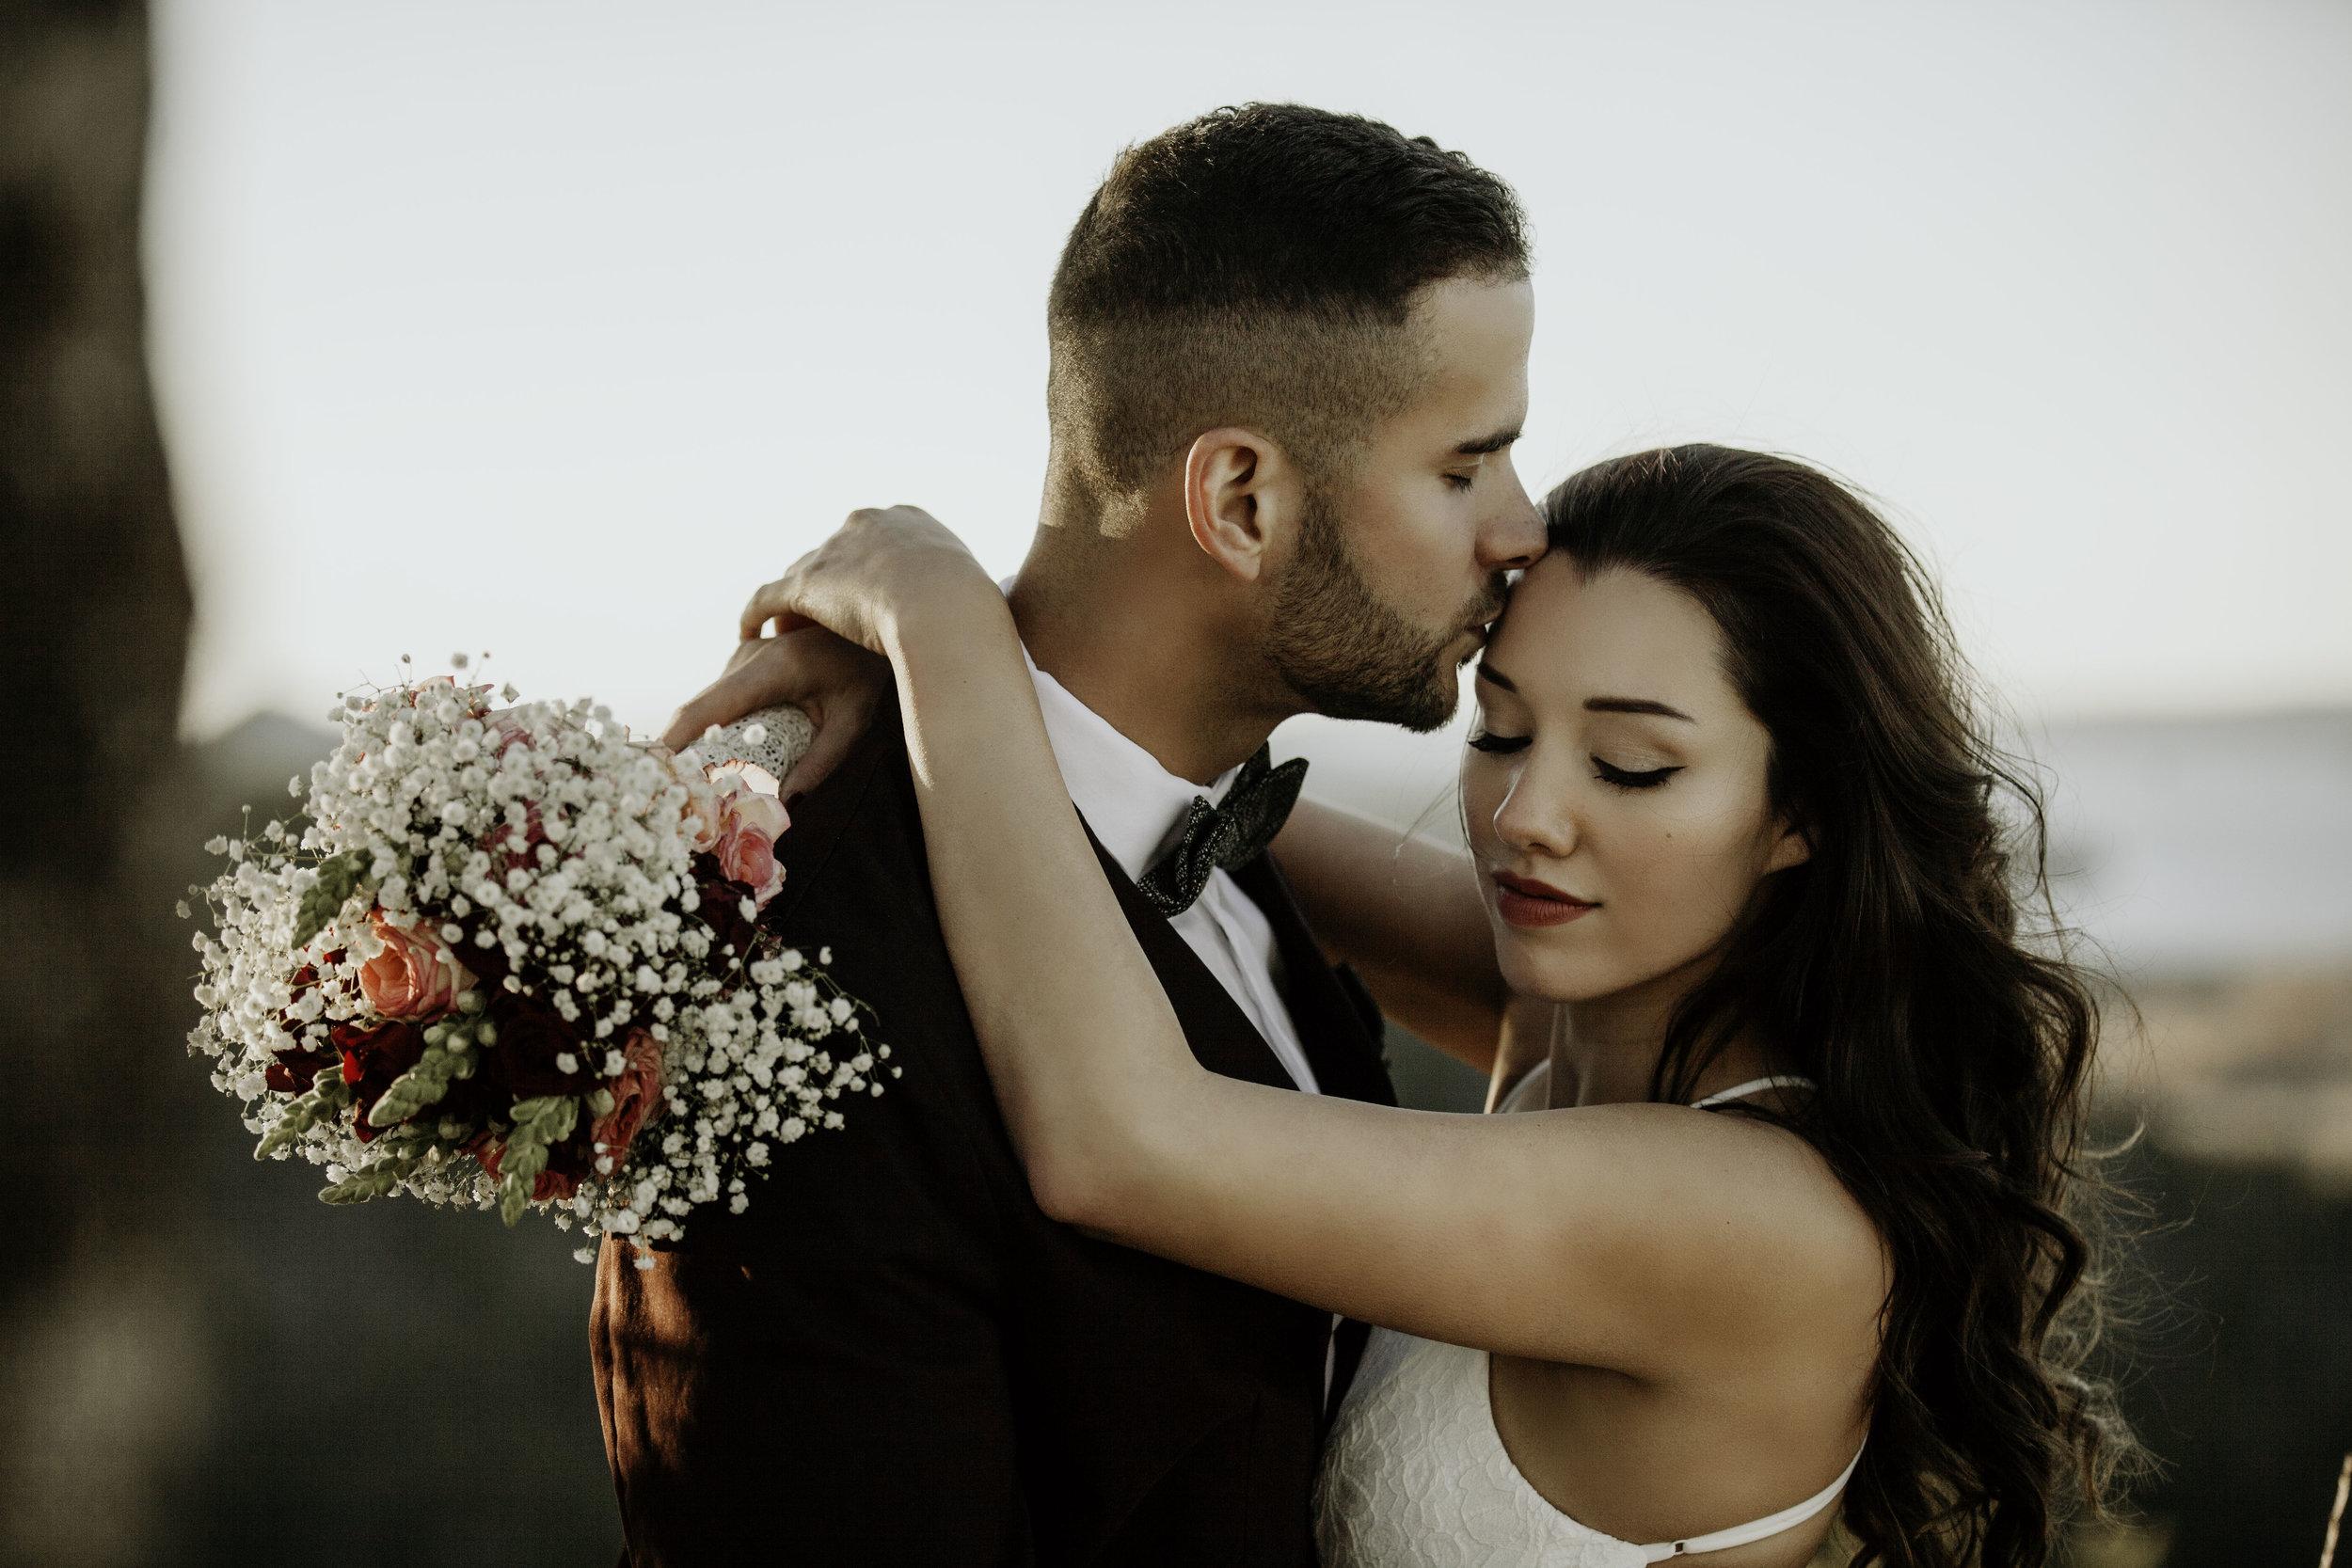 dessert-conway-central-arkansas-bridal-photographer-little-rock-photography-outdoor-wedding-boho-fashion-engagement-elopement-bouquet-bride-soiree-magazine-photoshoot-arkansasbride-pinnacle-mountain